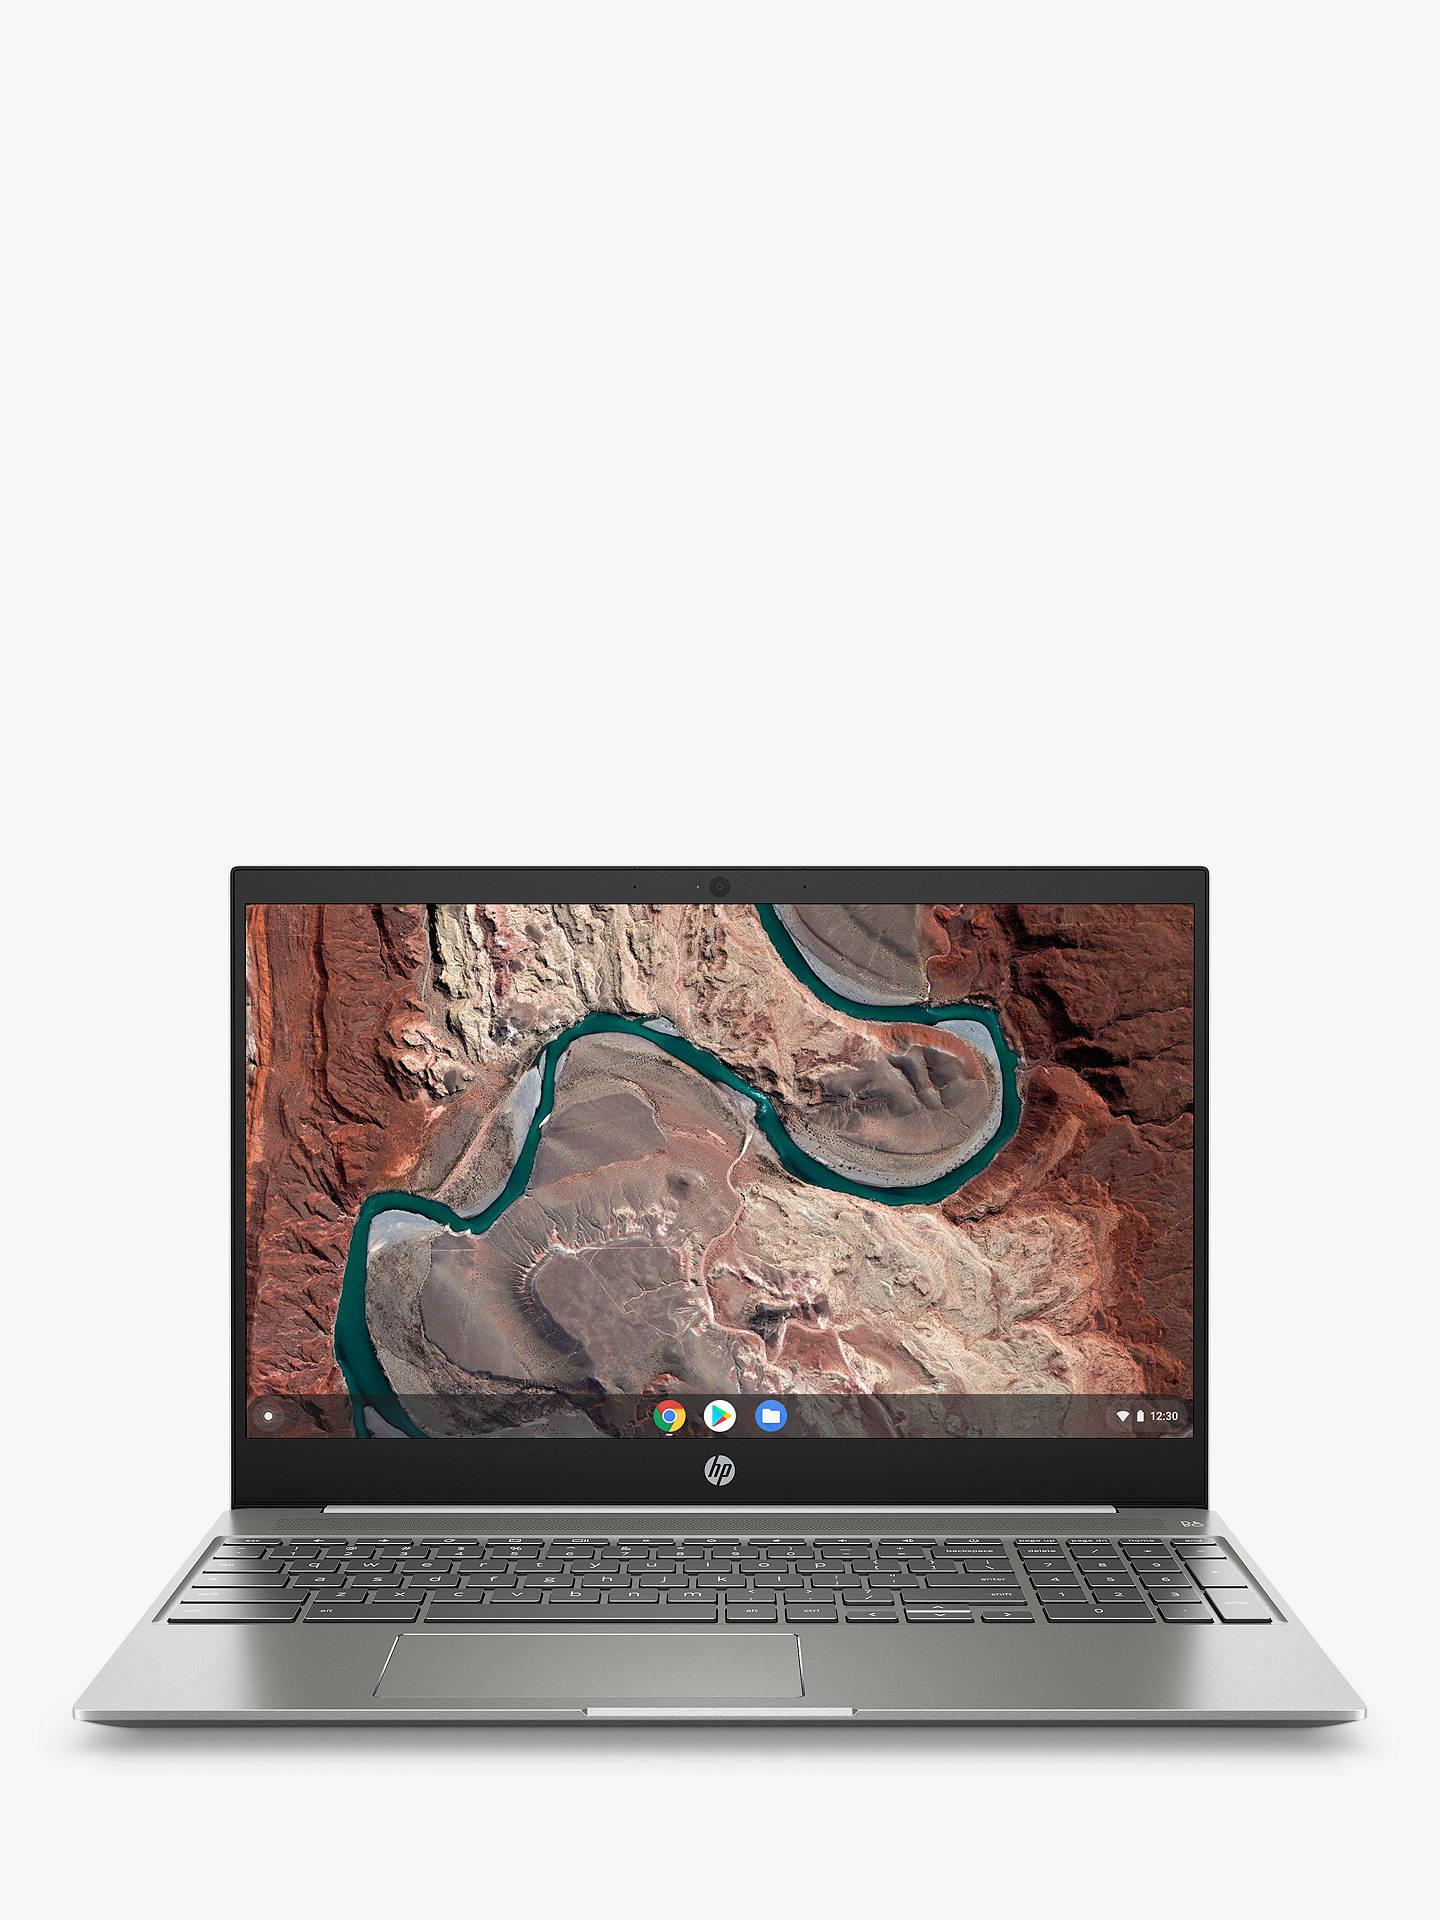 HP 15-de0000na Chromebook Laptop, Intel Pentium Gold Processor, 4G RAM,  64GB eMMC, 15 6